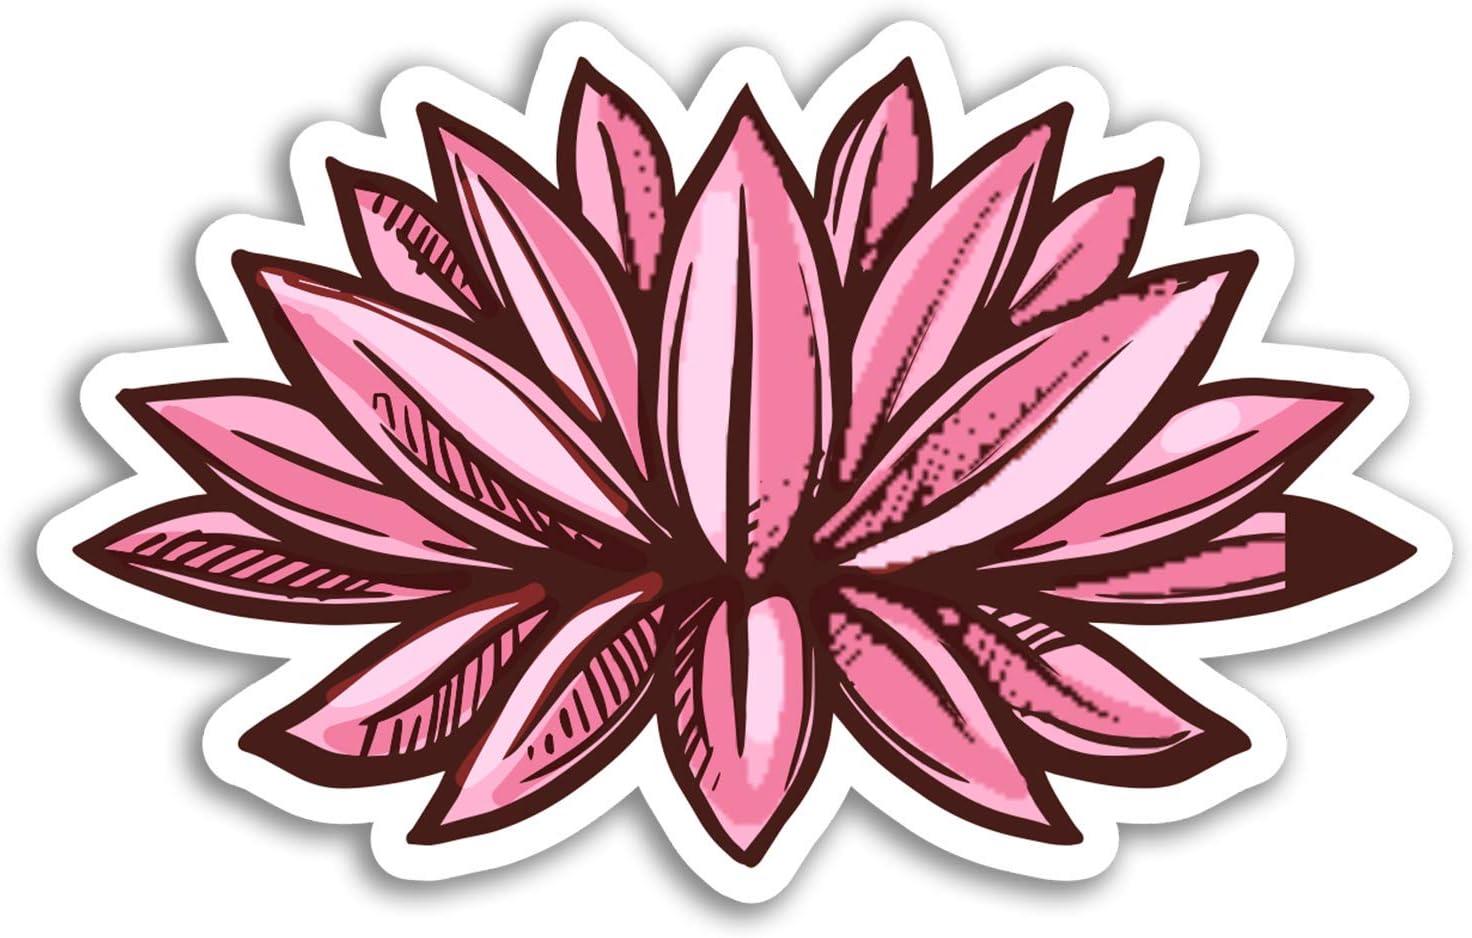 2 x 10cm Pink Lotus Flower Vinyl Stickers - India Sticker Laptop Luggage #17680 (10cm Wide)